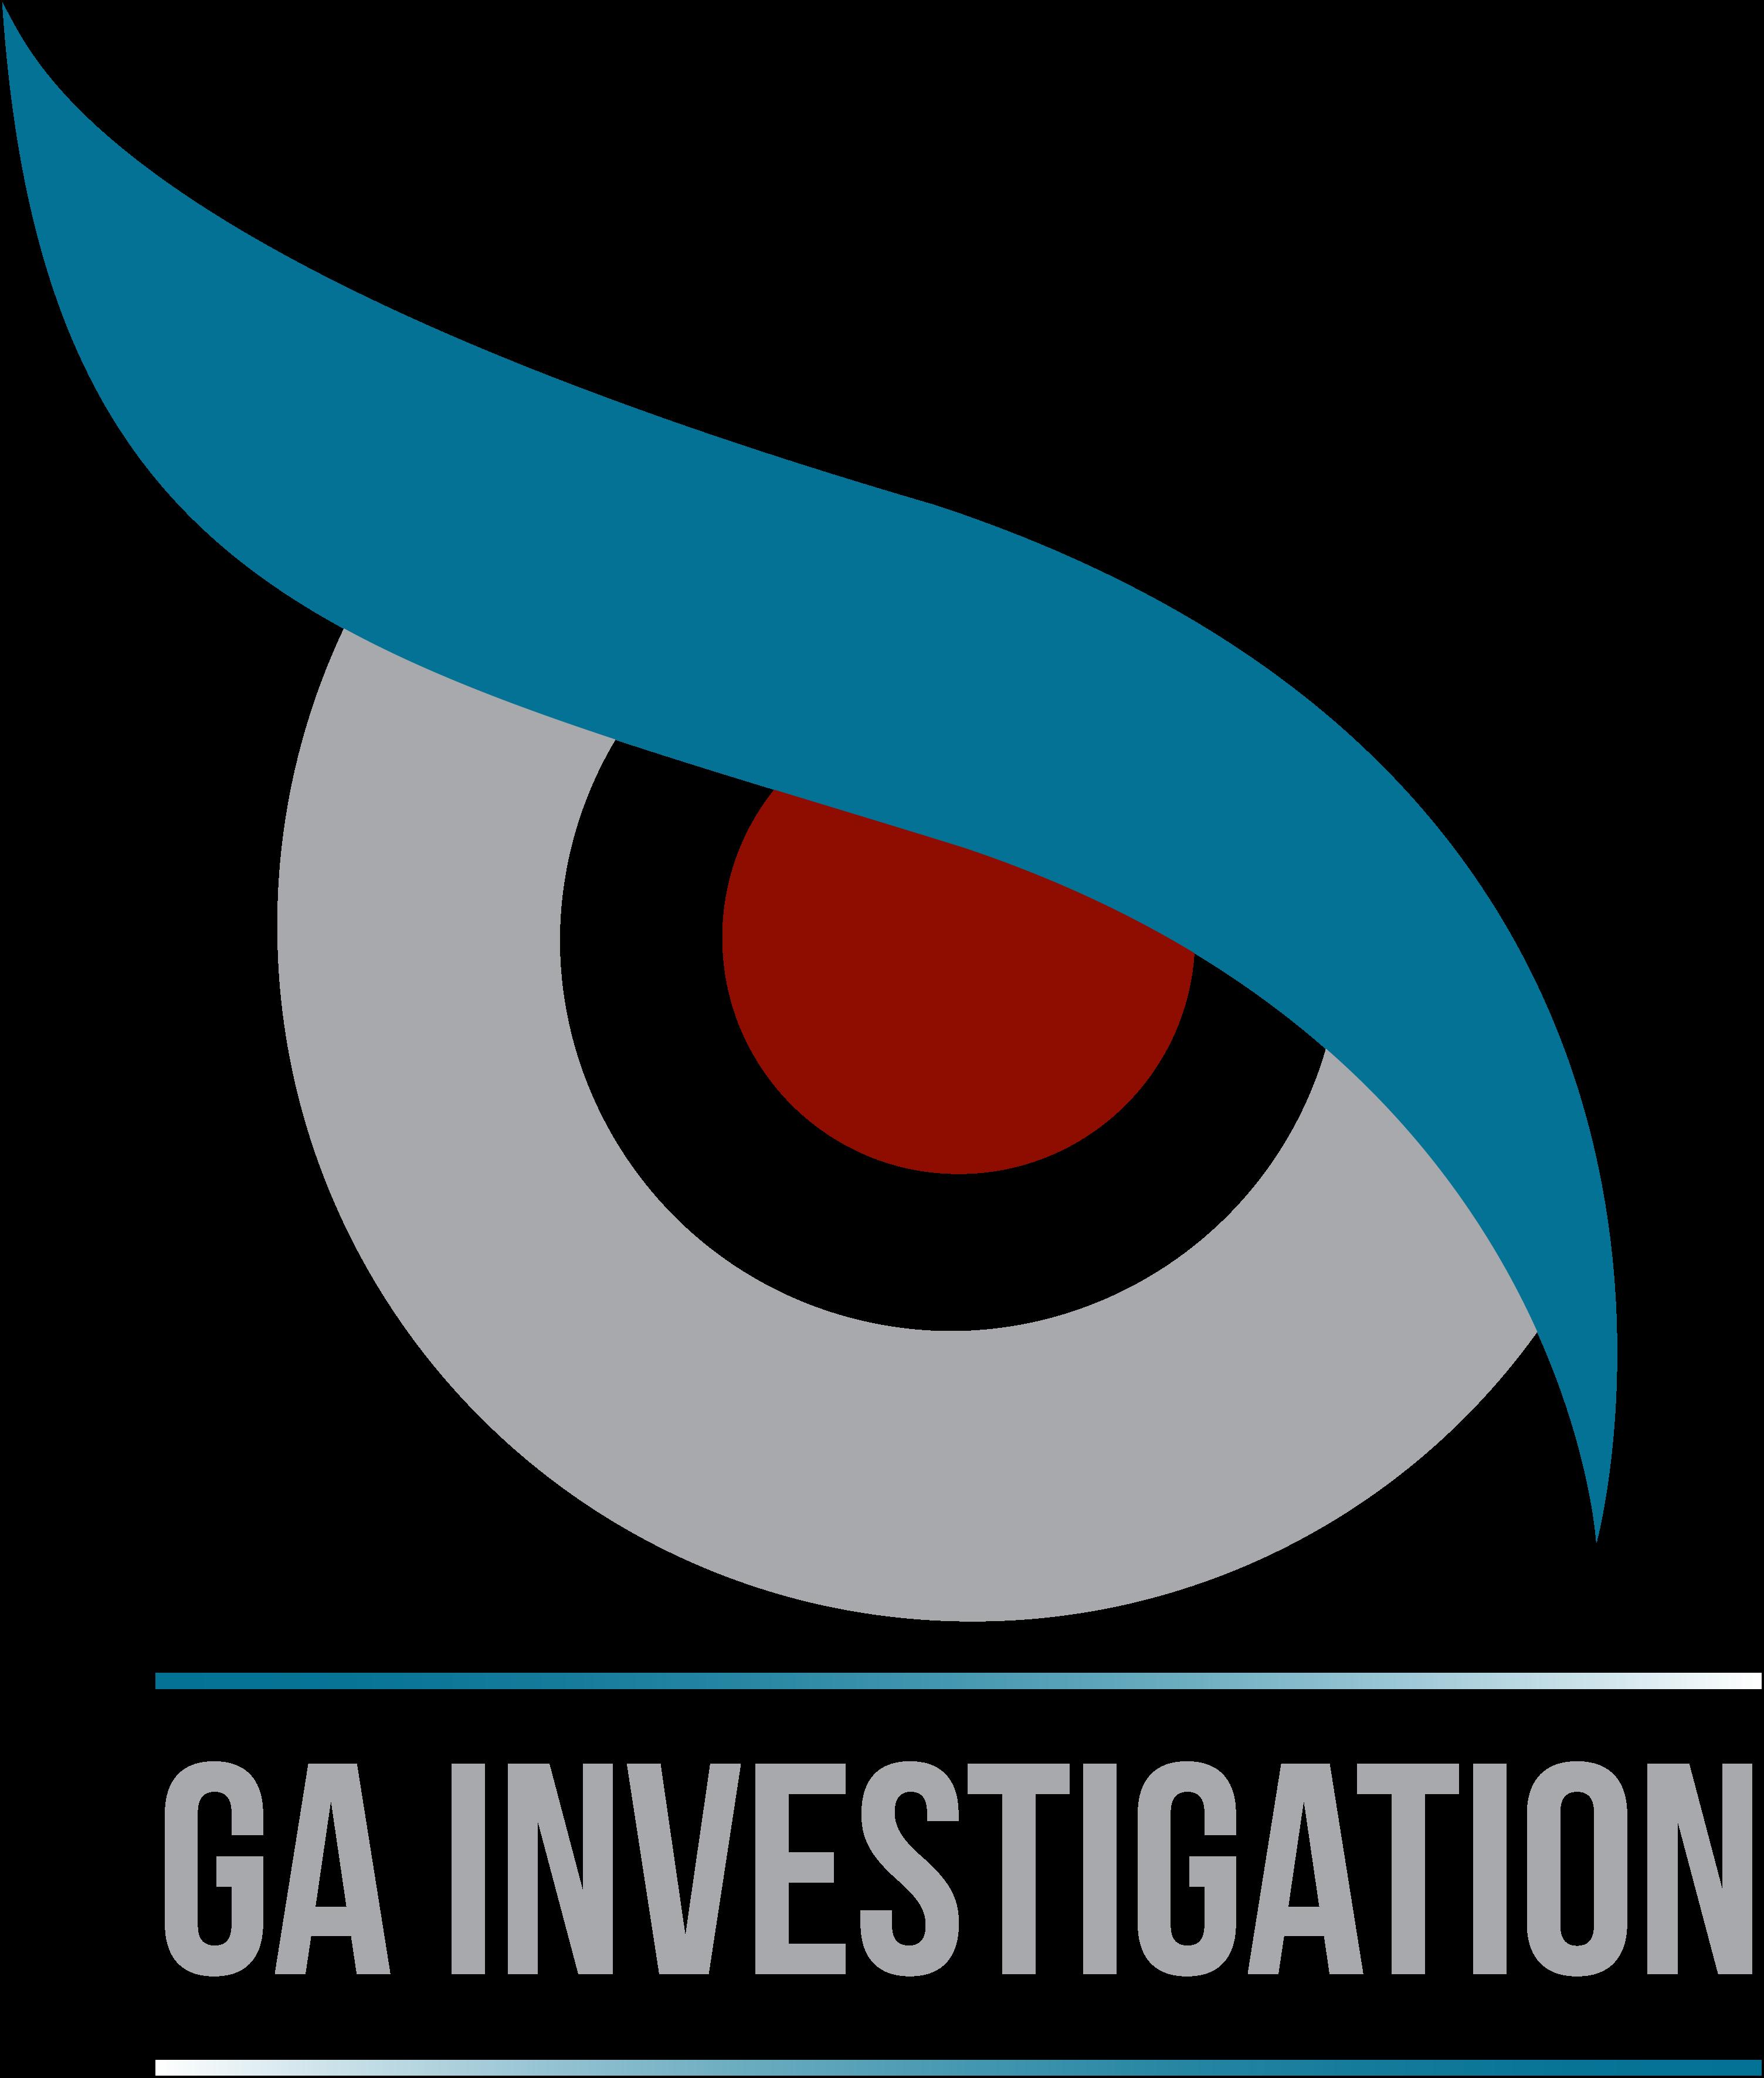 GA Investigation